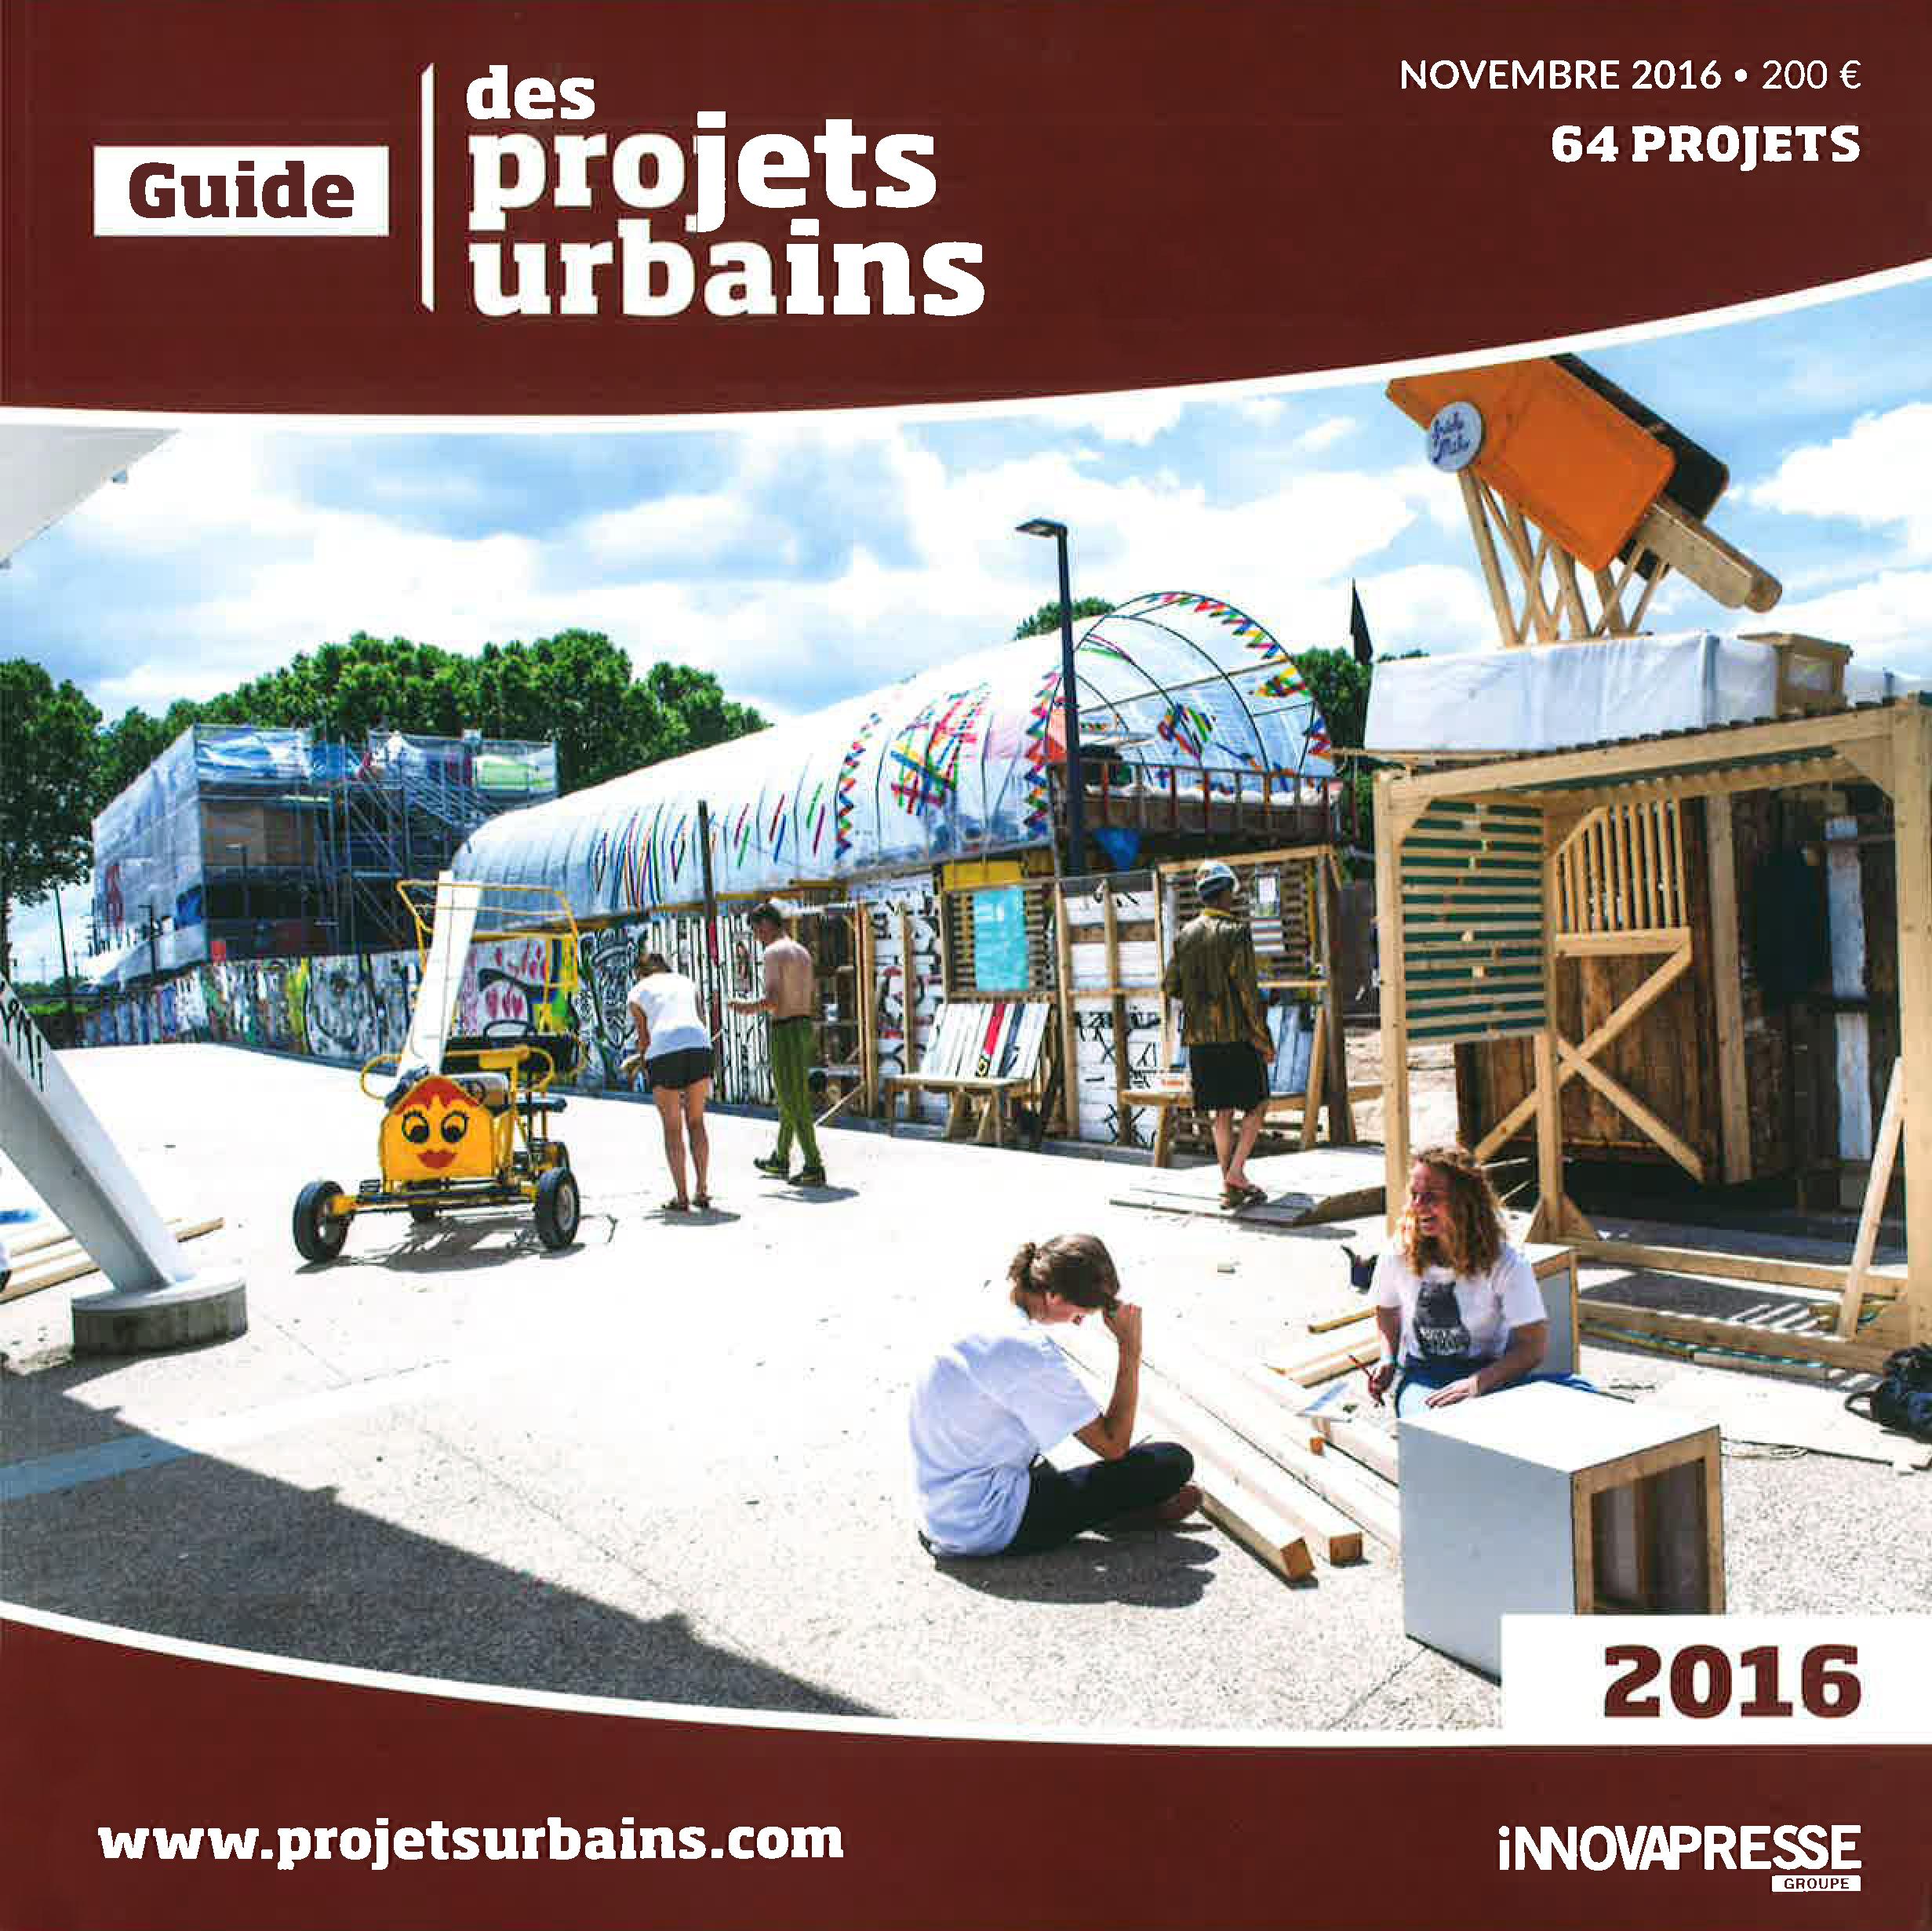 Guide des projets urbains 11/2016